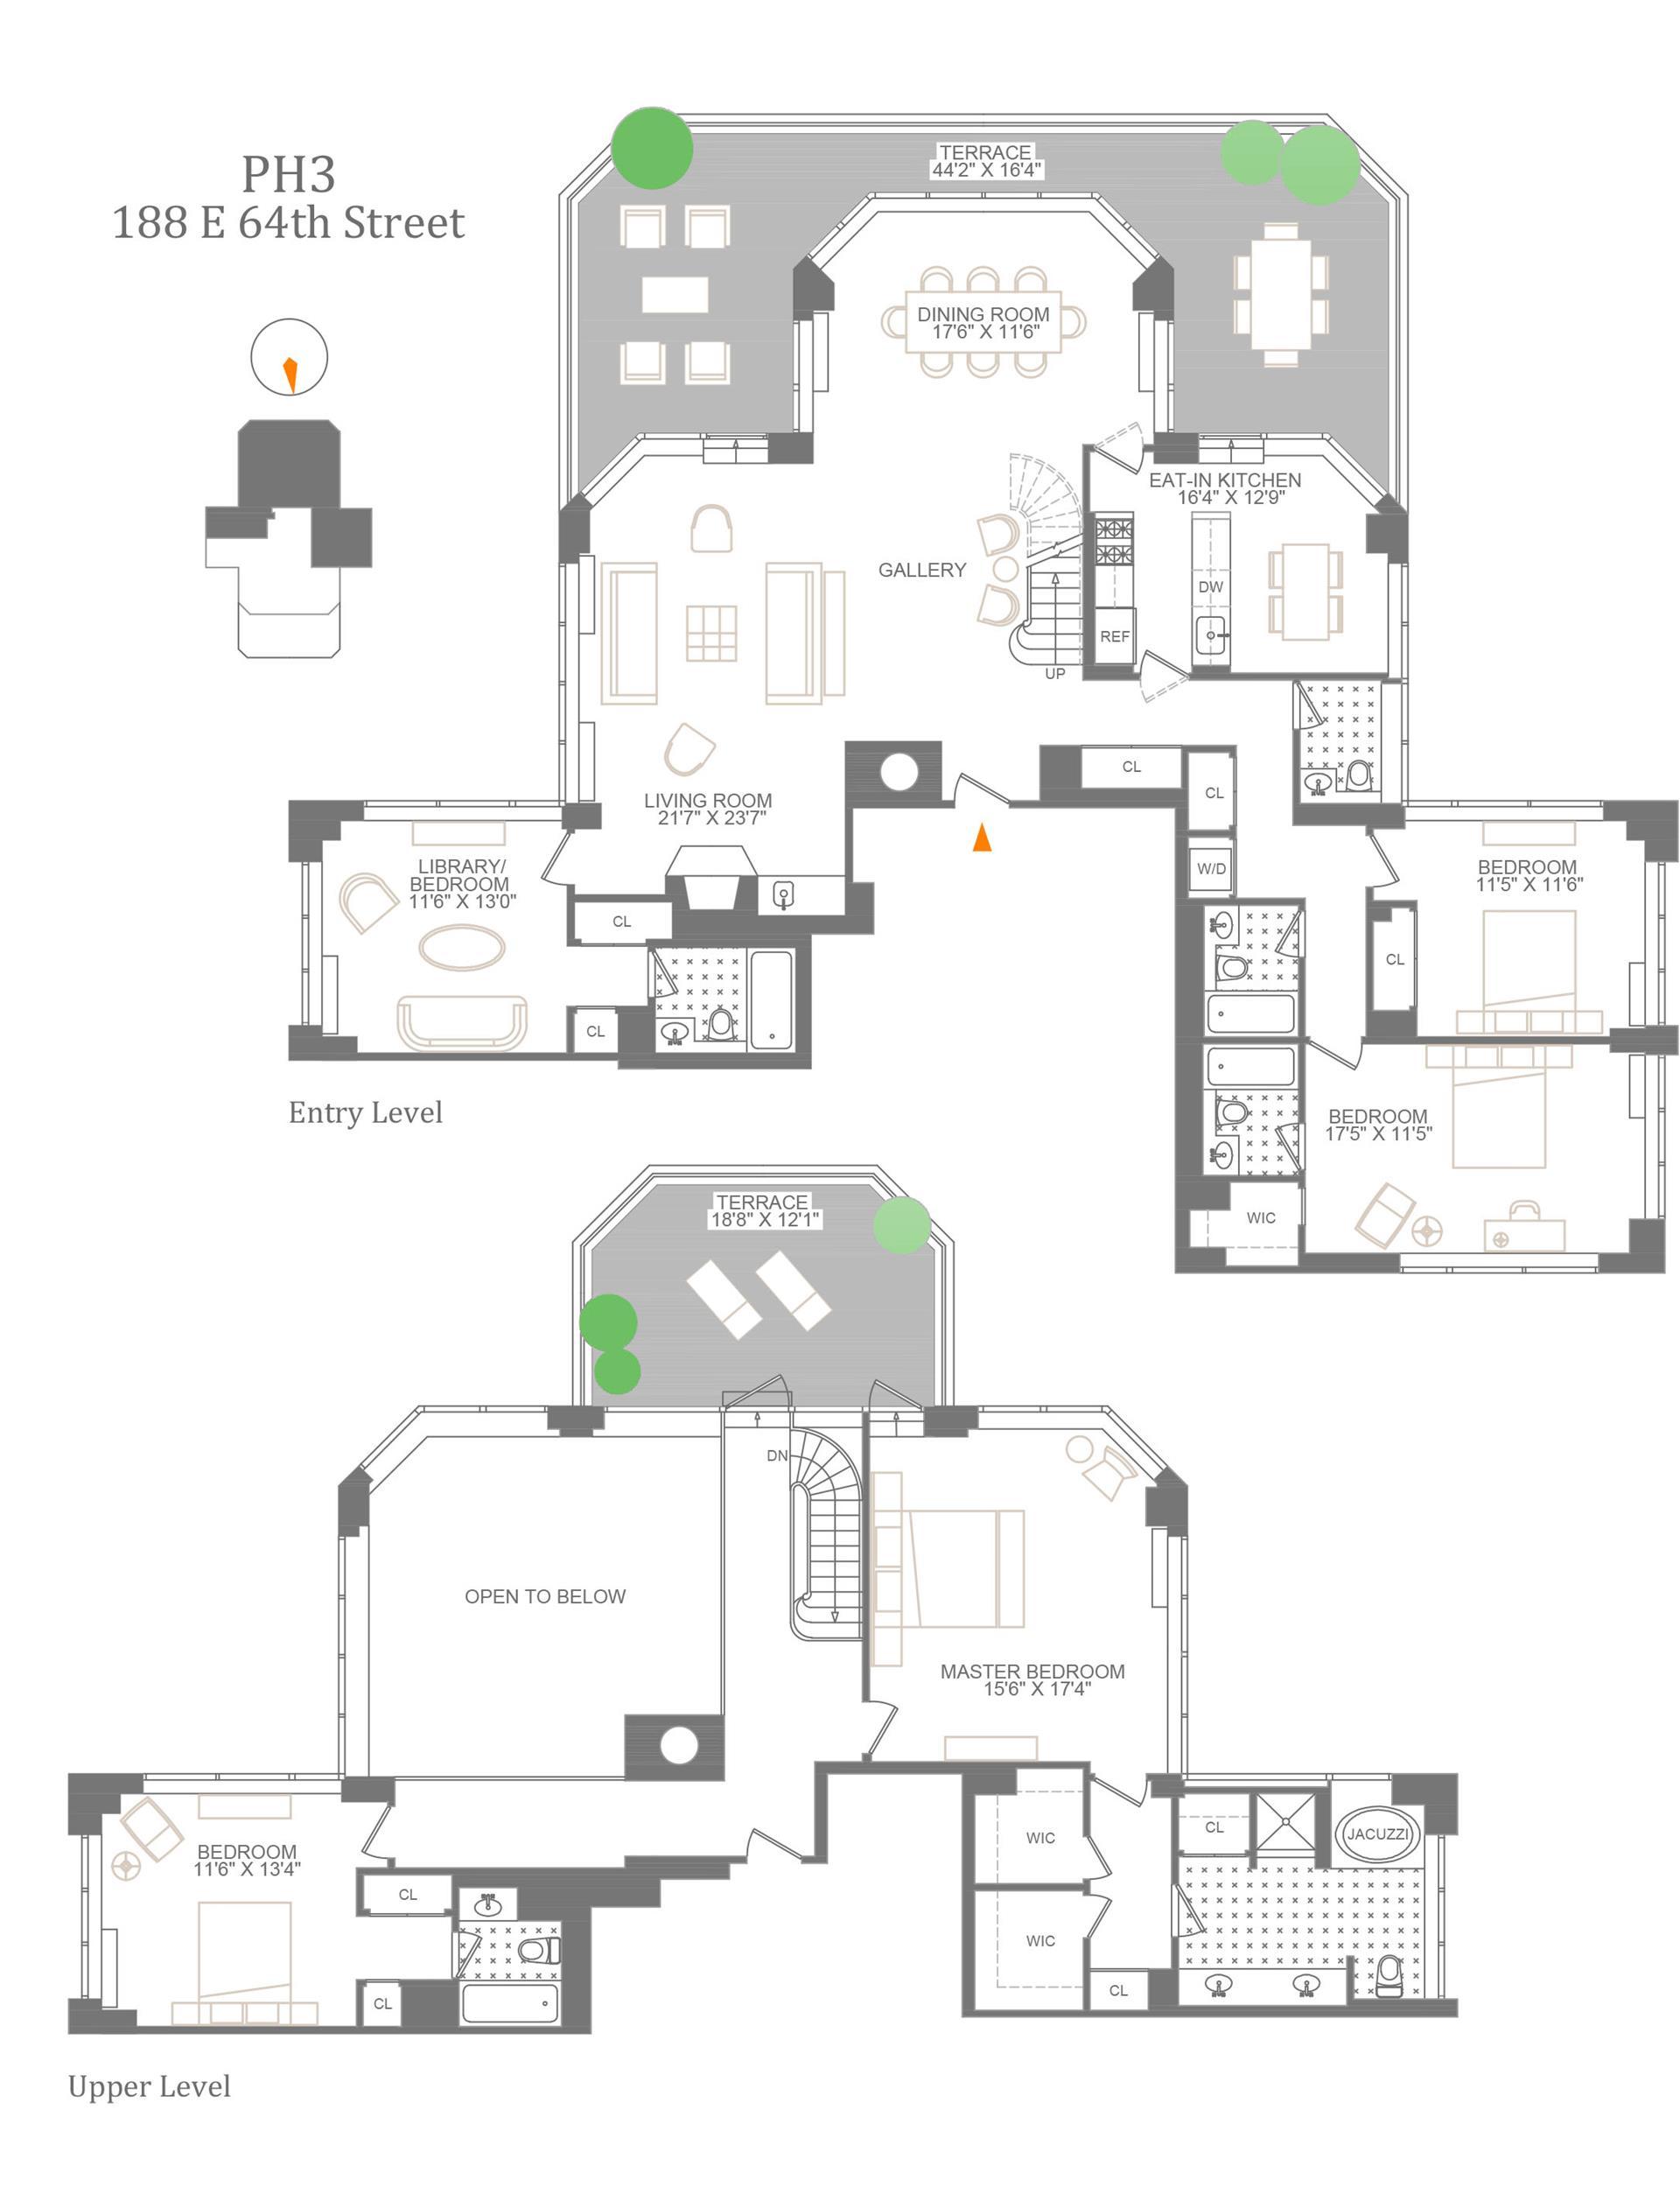 Floor plan of The Royale, 188 East 64th Street, PH3 - Upper East Side, New York